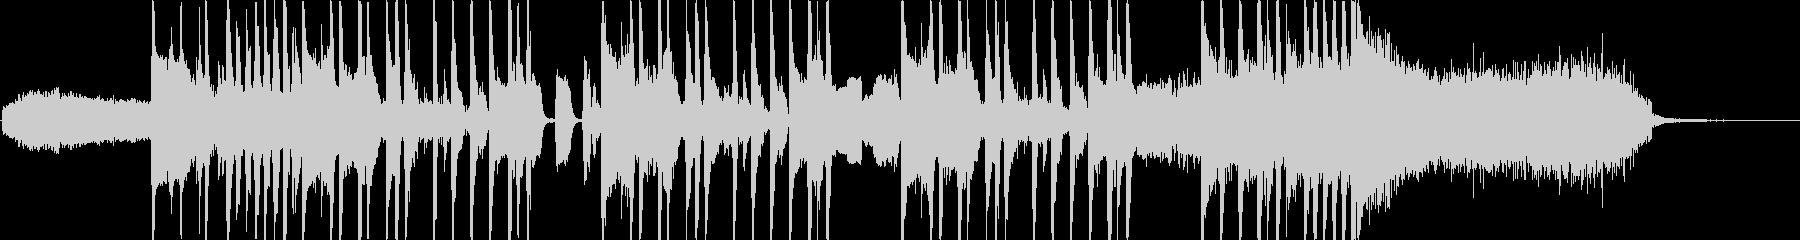 CMや場面転換に合うファンキーサウンドの未再生の波形